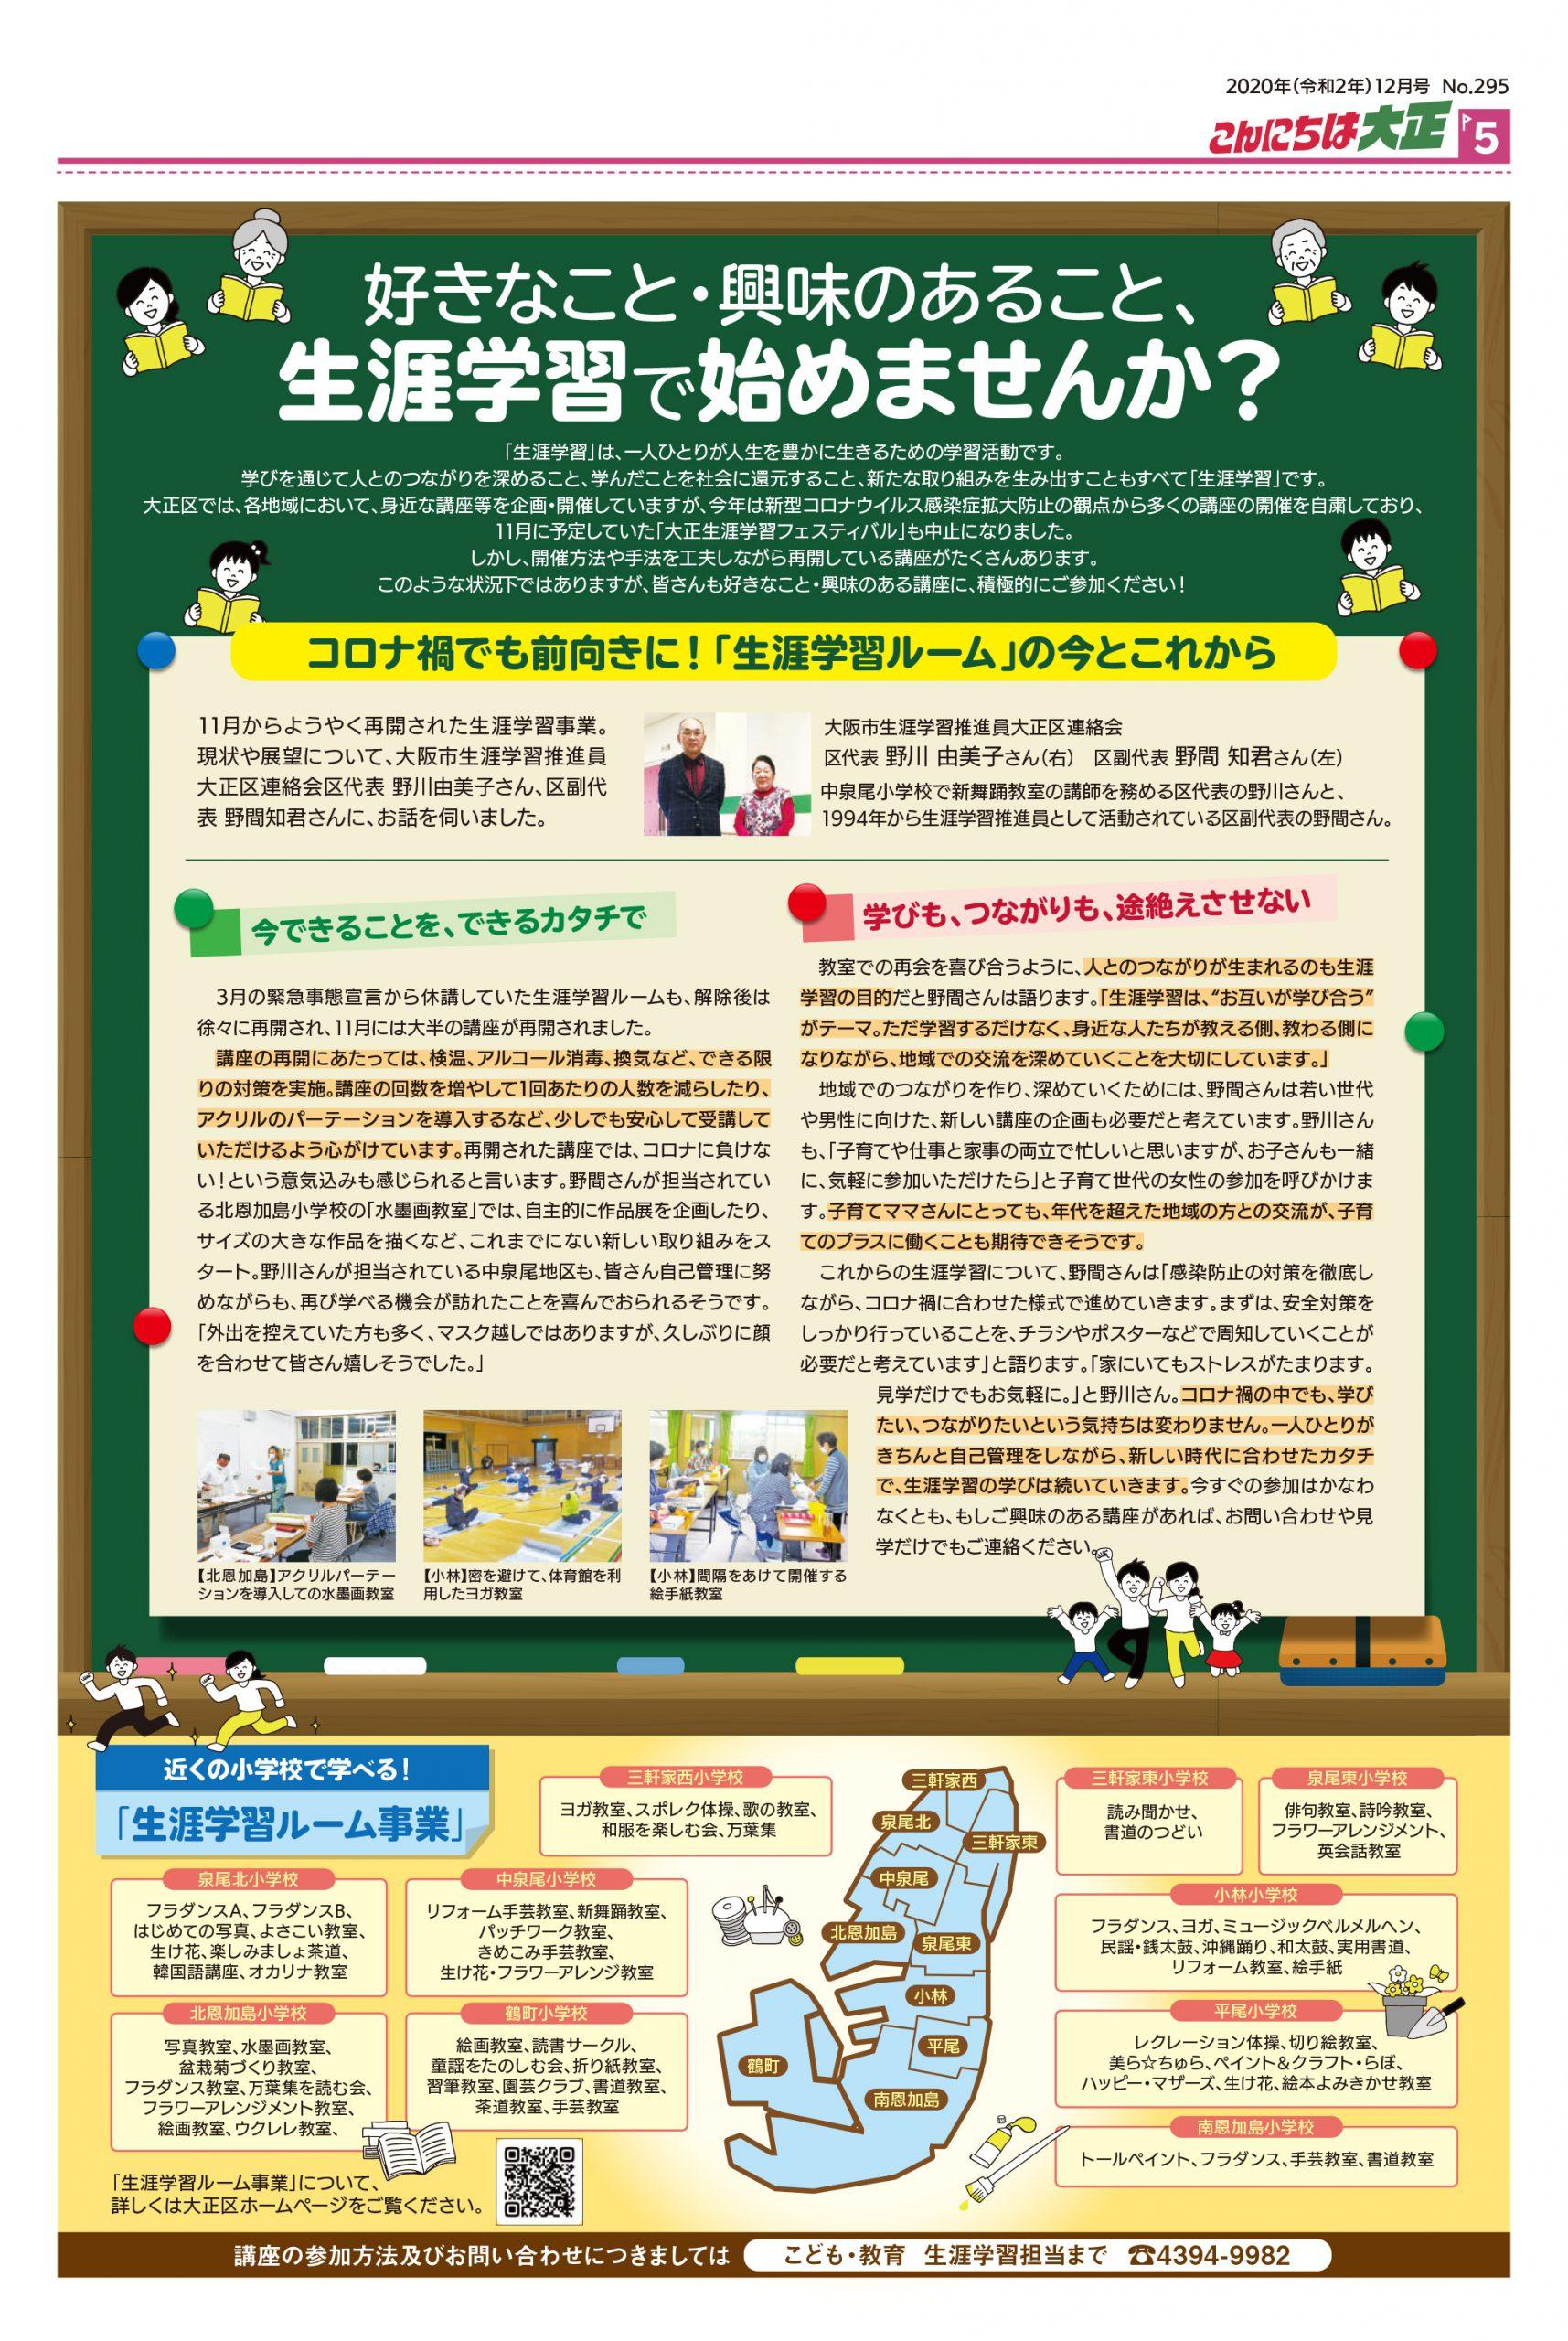 こんにちは大正12月号|2020.12 大阪市廃止・特別区設置住民投票 開票結果(大阪市大正区)